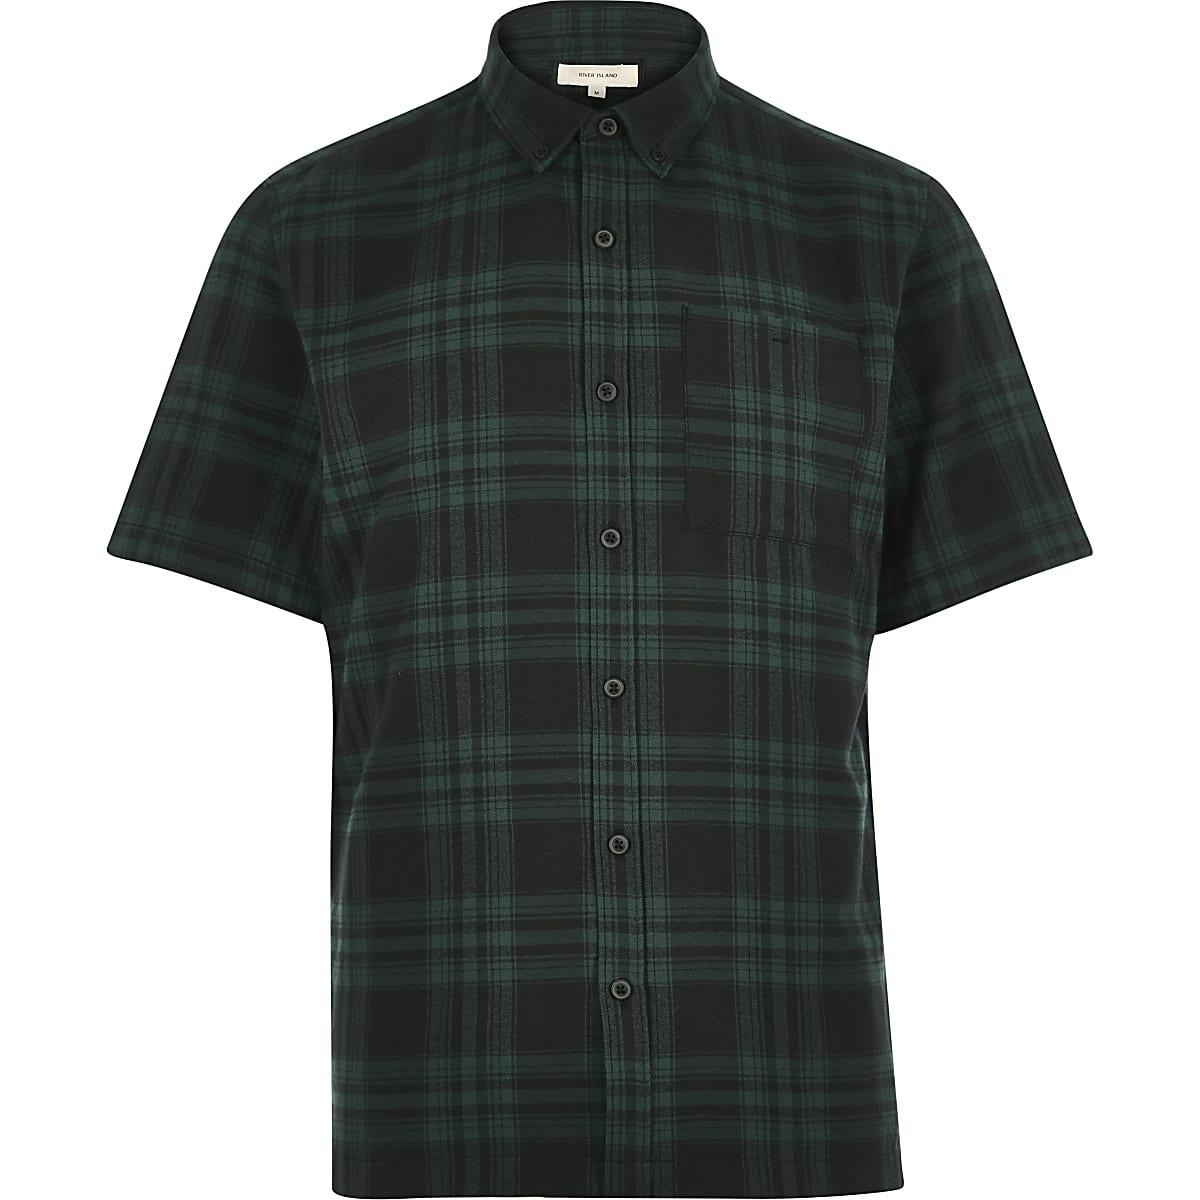 Green check twill short sleeve shirt